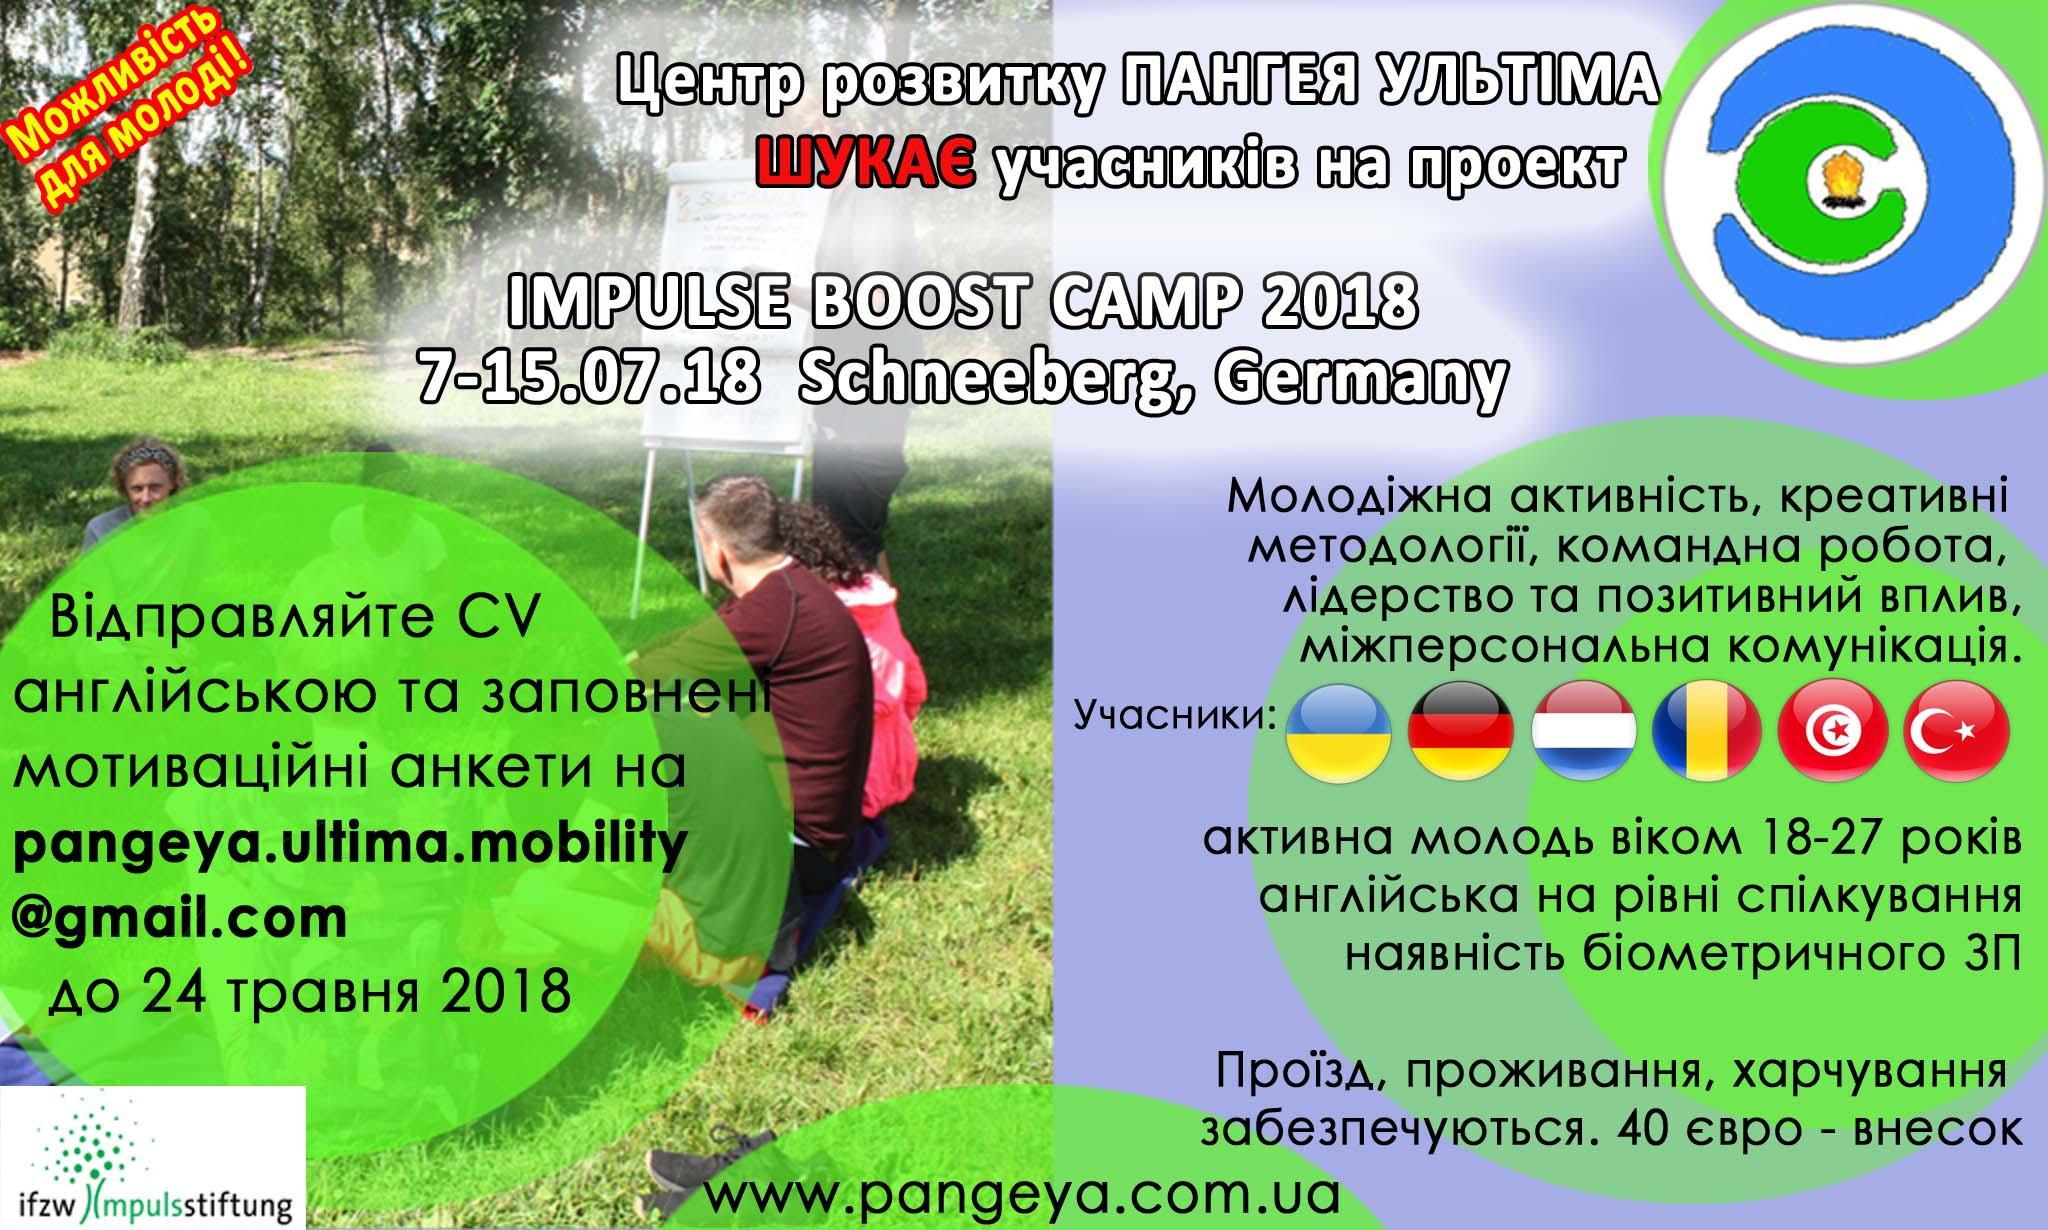 Impulse Boost Camp 2018